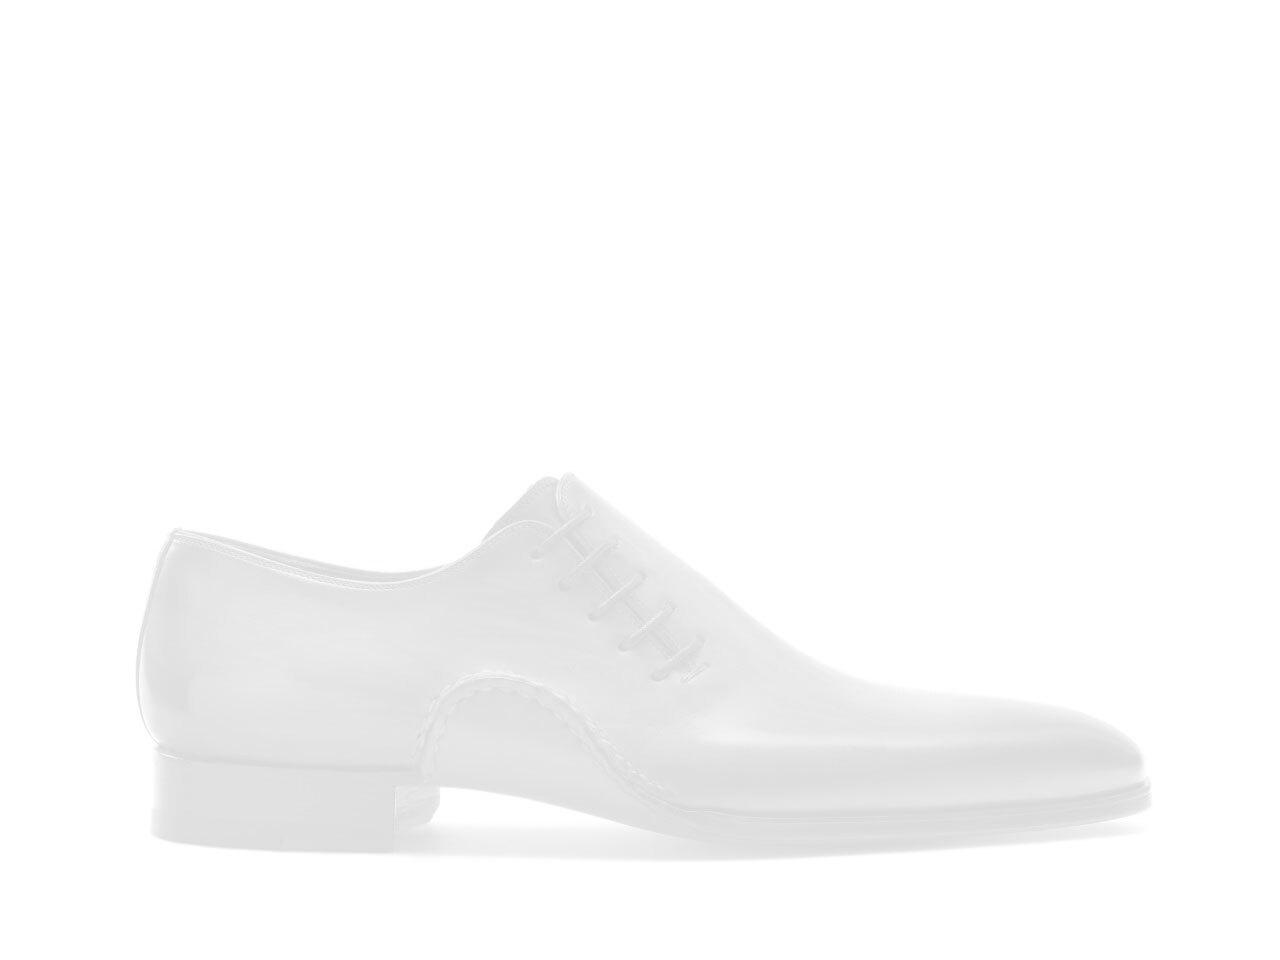 Sole of the Magnanni Cabrera Black Men's Fisherman Sandals